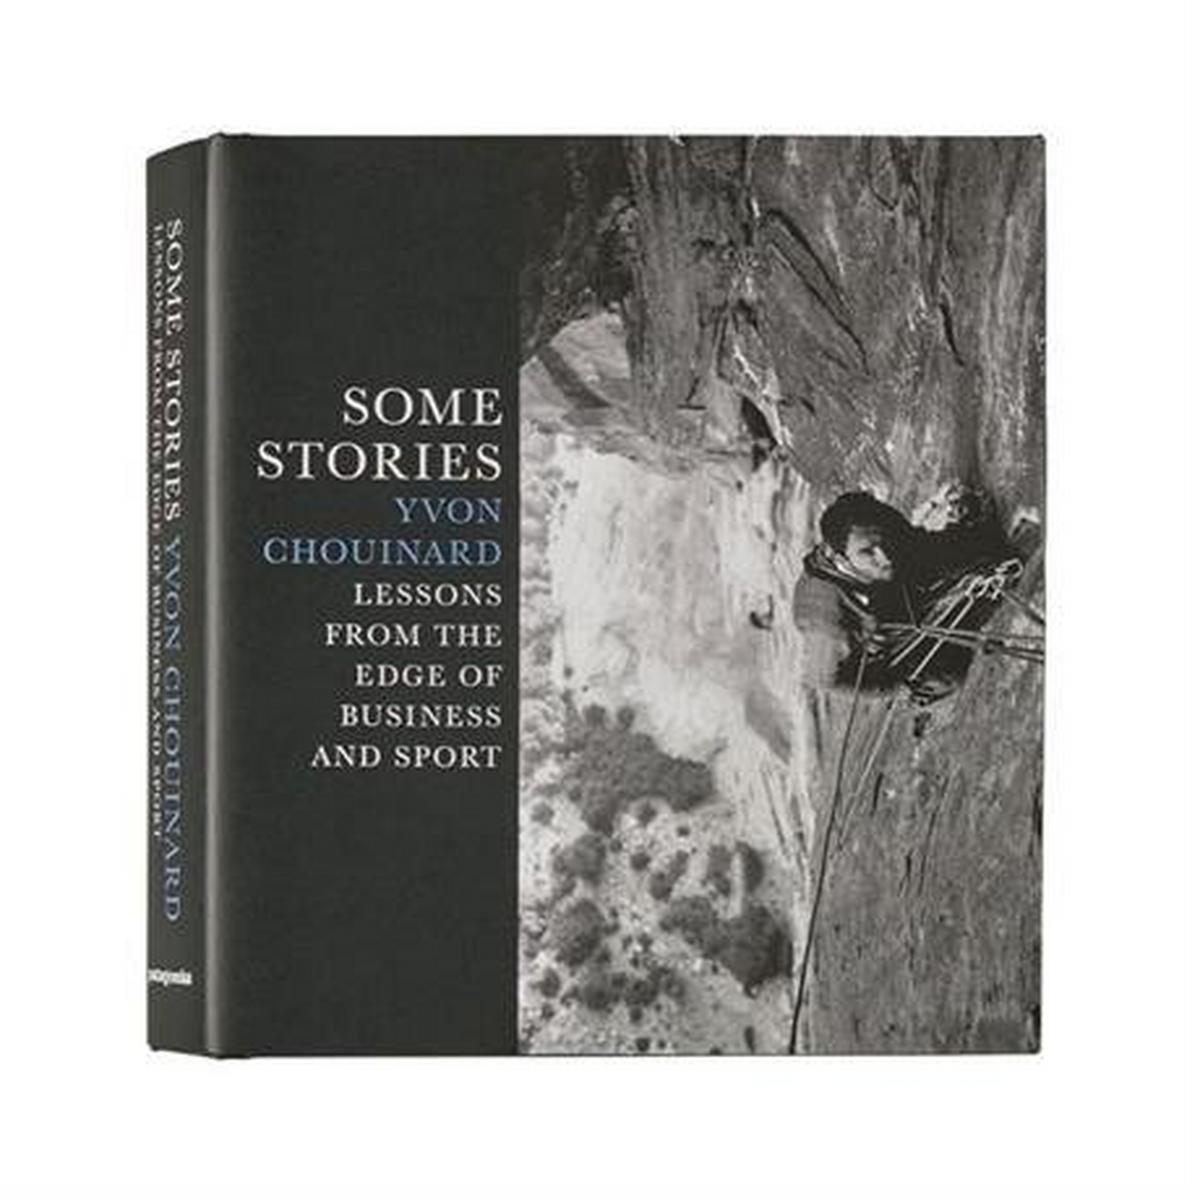 Patagonia Book: Some Stories: Yvon Chouinard